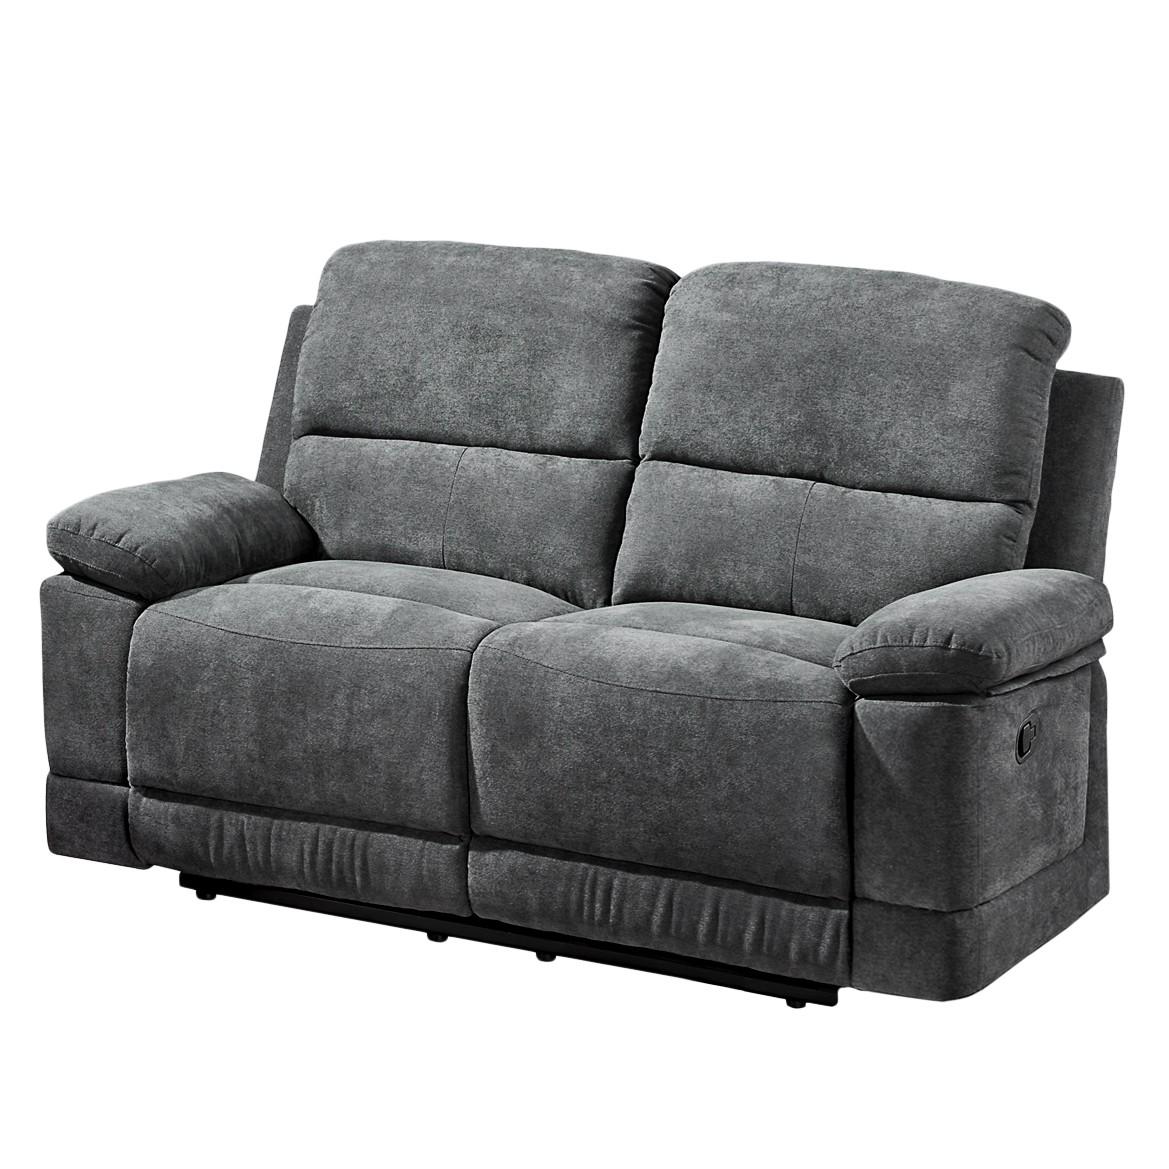 sofa leticia 2 sitzer lukait. Black Bedroom Furniture Sets. Home Design Ideas